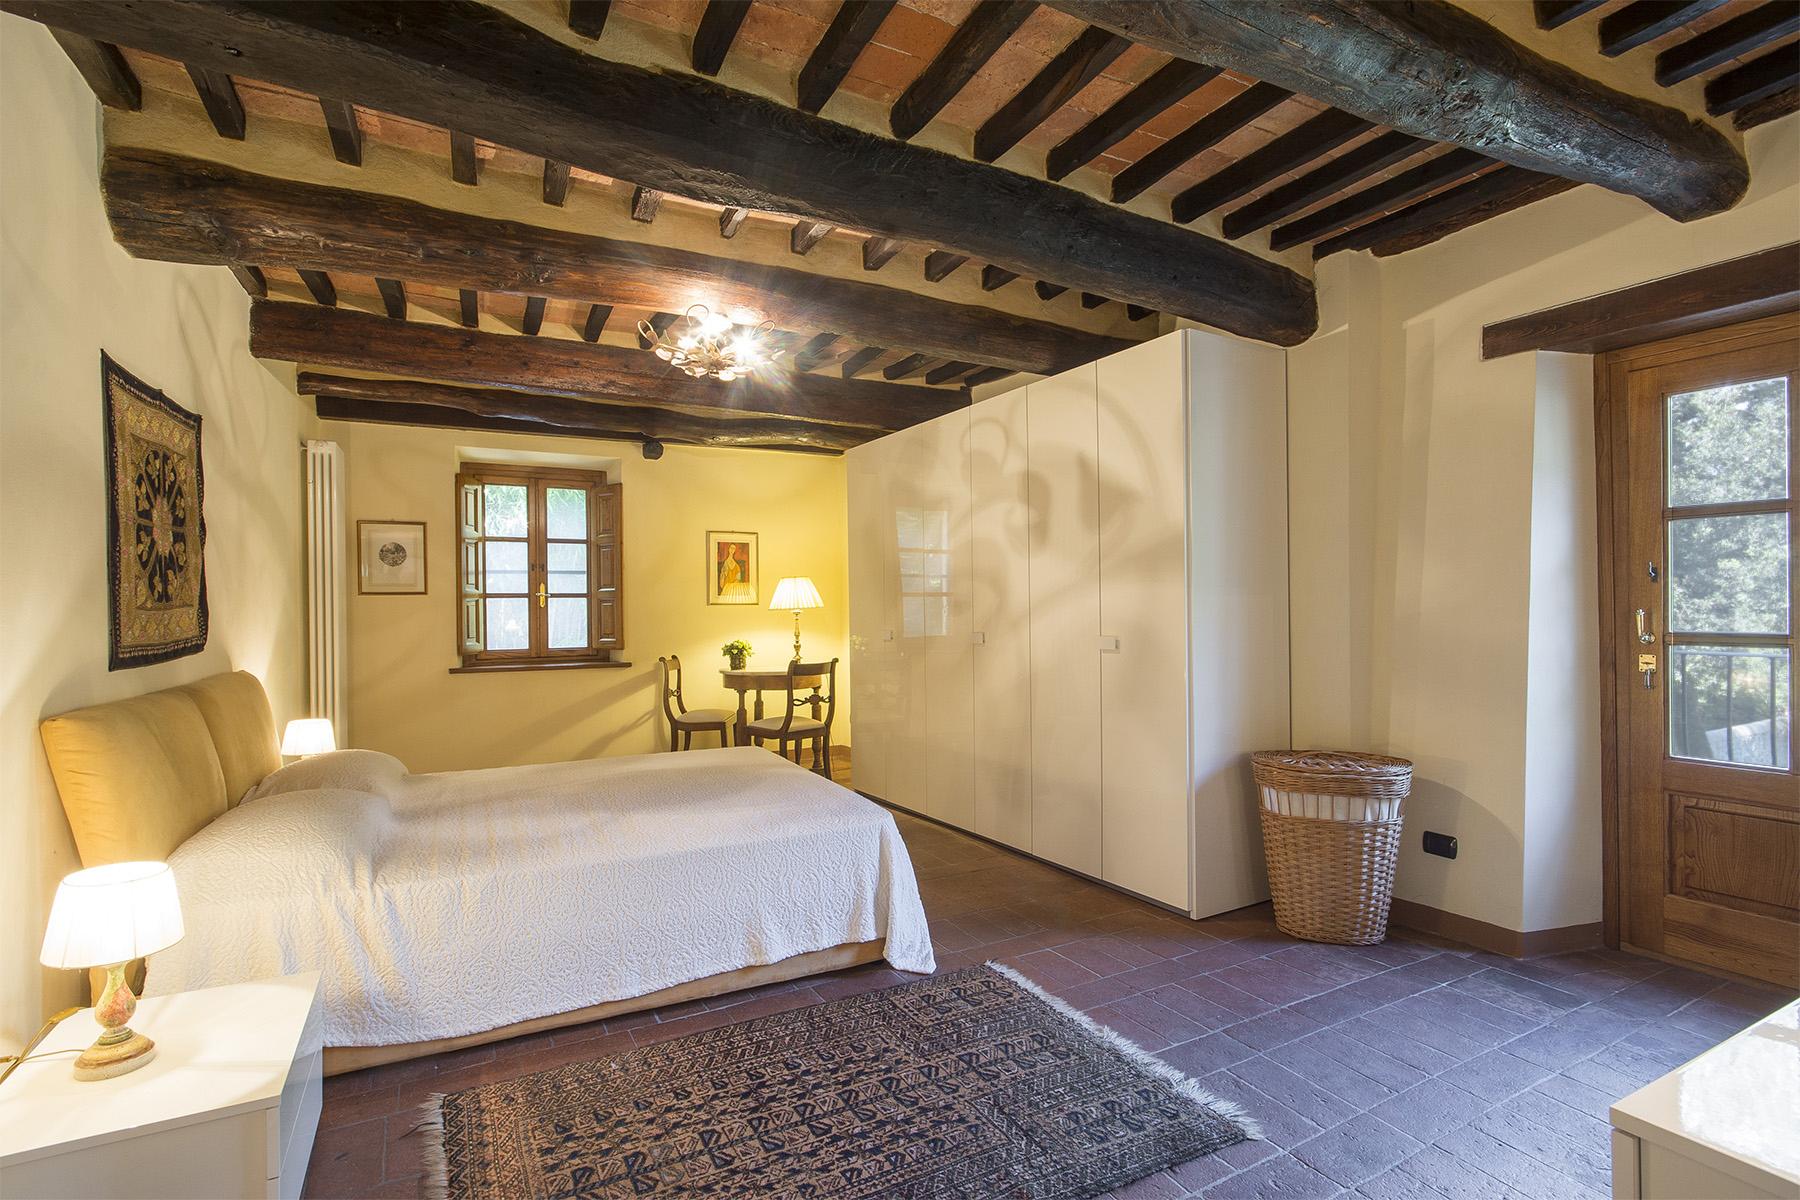 Villa in Vendita a Lucca: 5 locali, 1150 mq - Foto 9